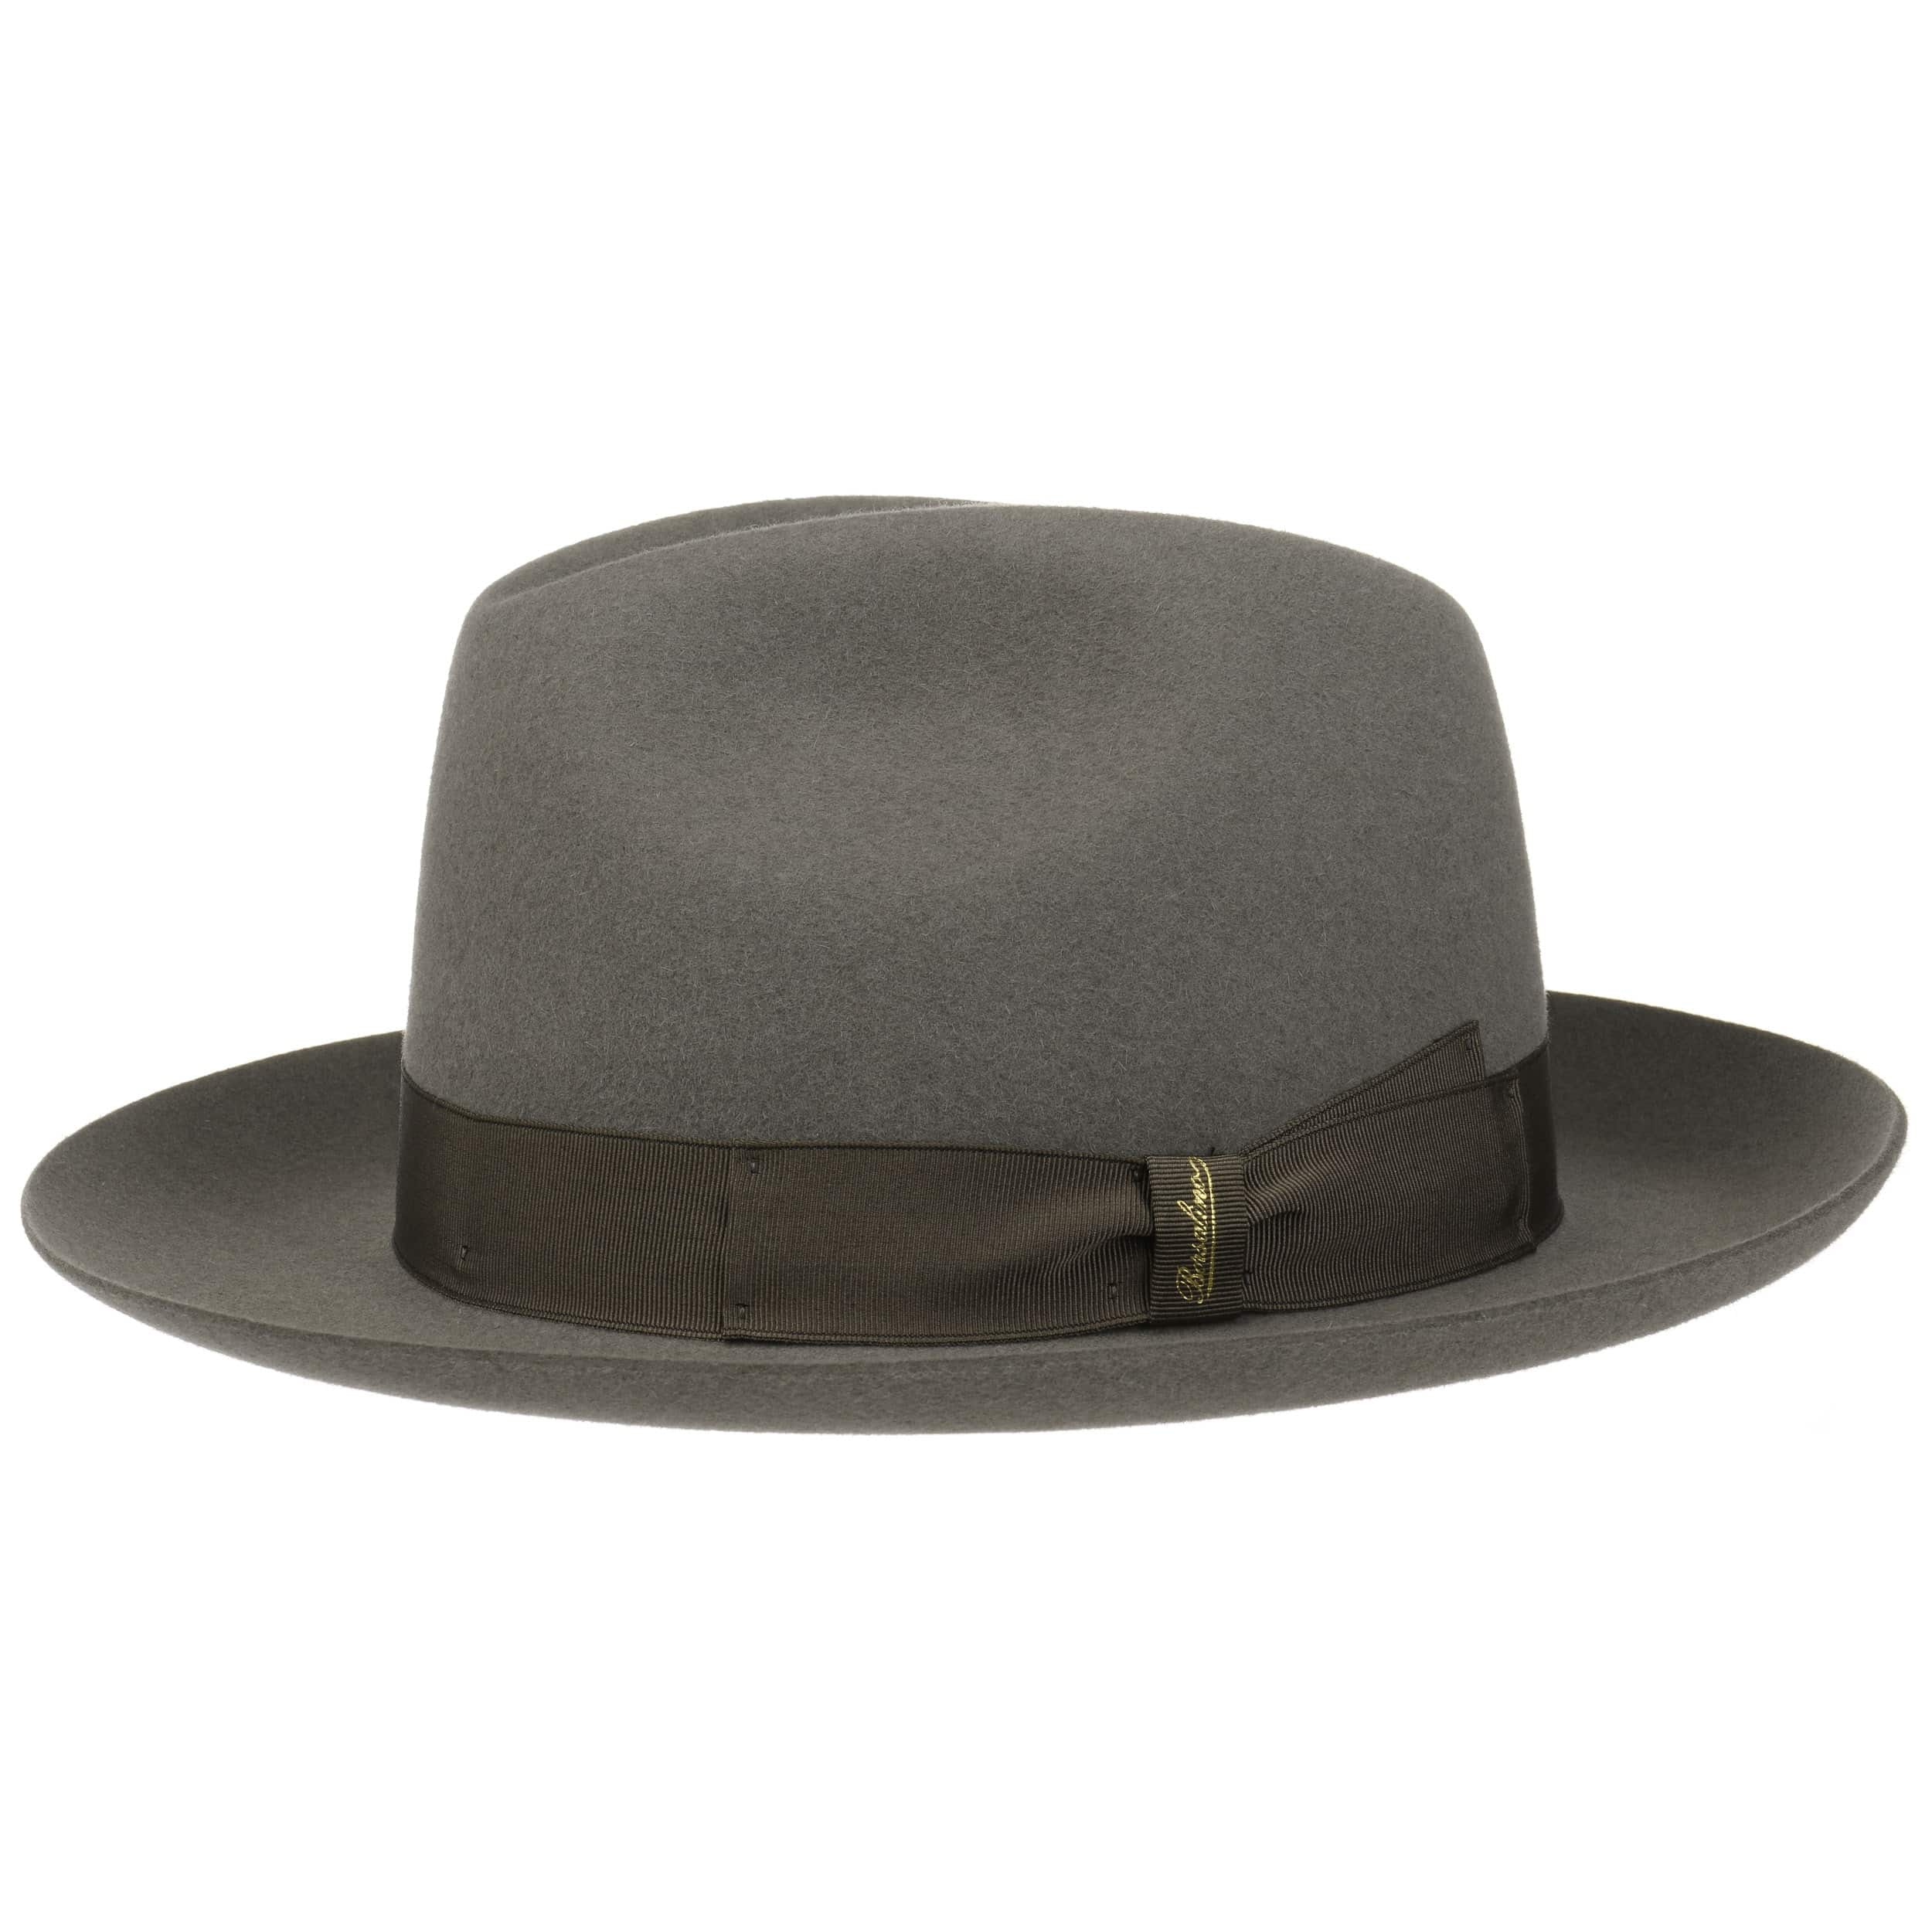 ... Cappello Bogart Marengo by Borsalino - grigio 4 ... 904131ad2559